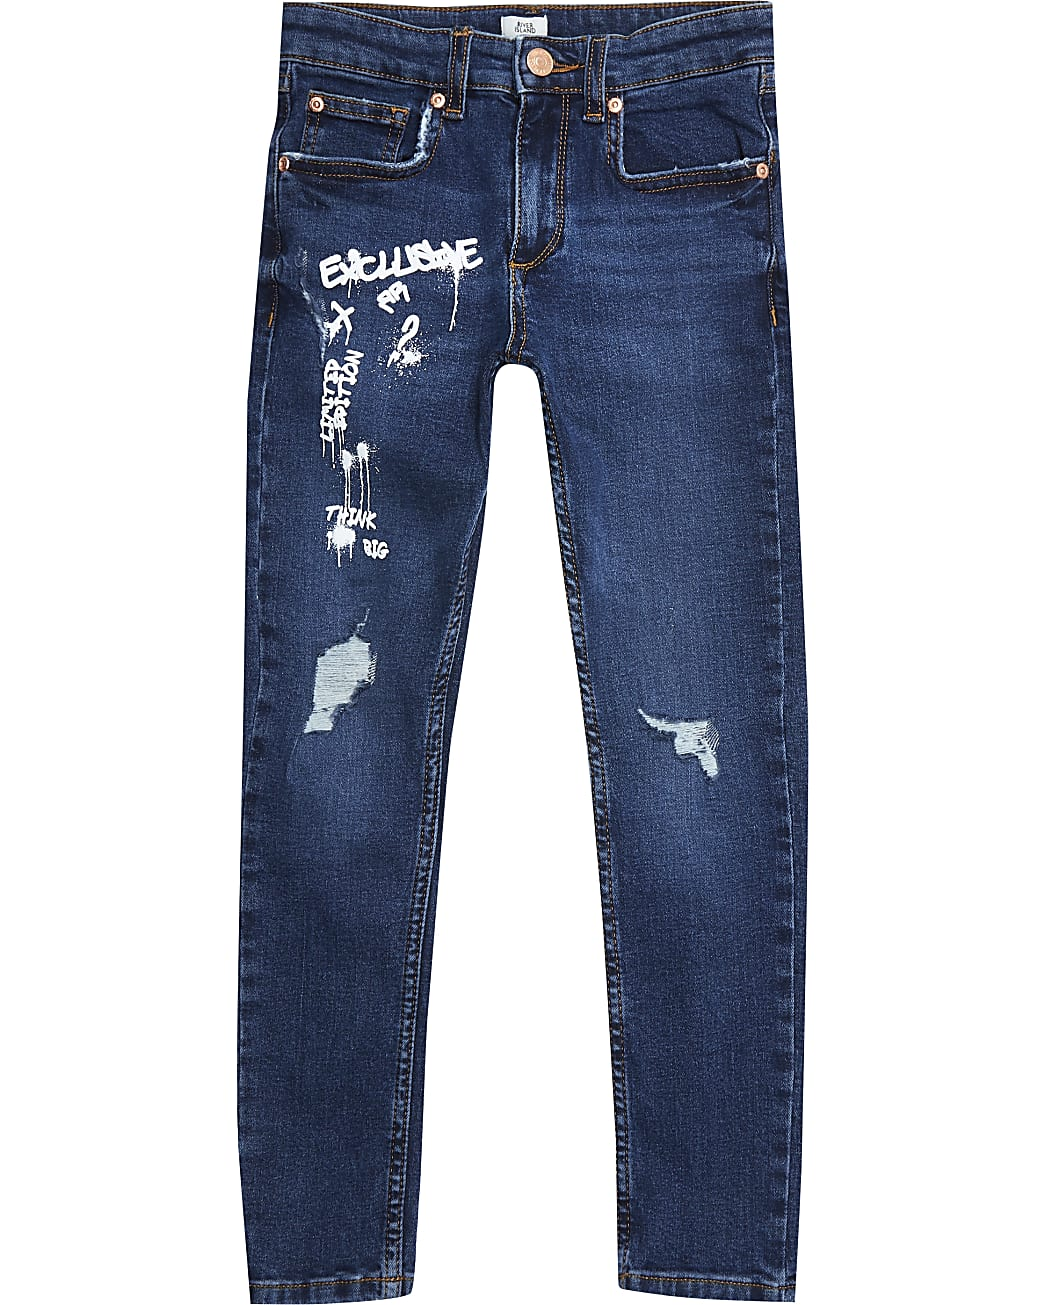 Boys blue graffiti print skinny jeans